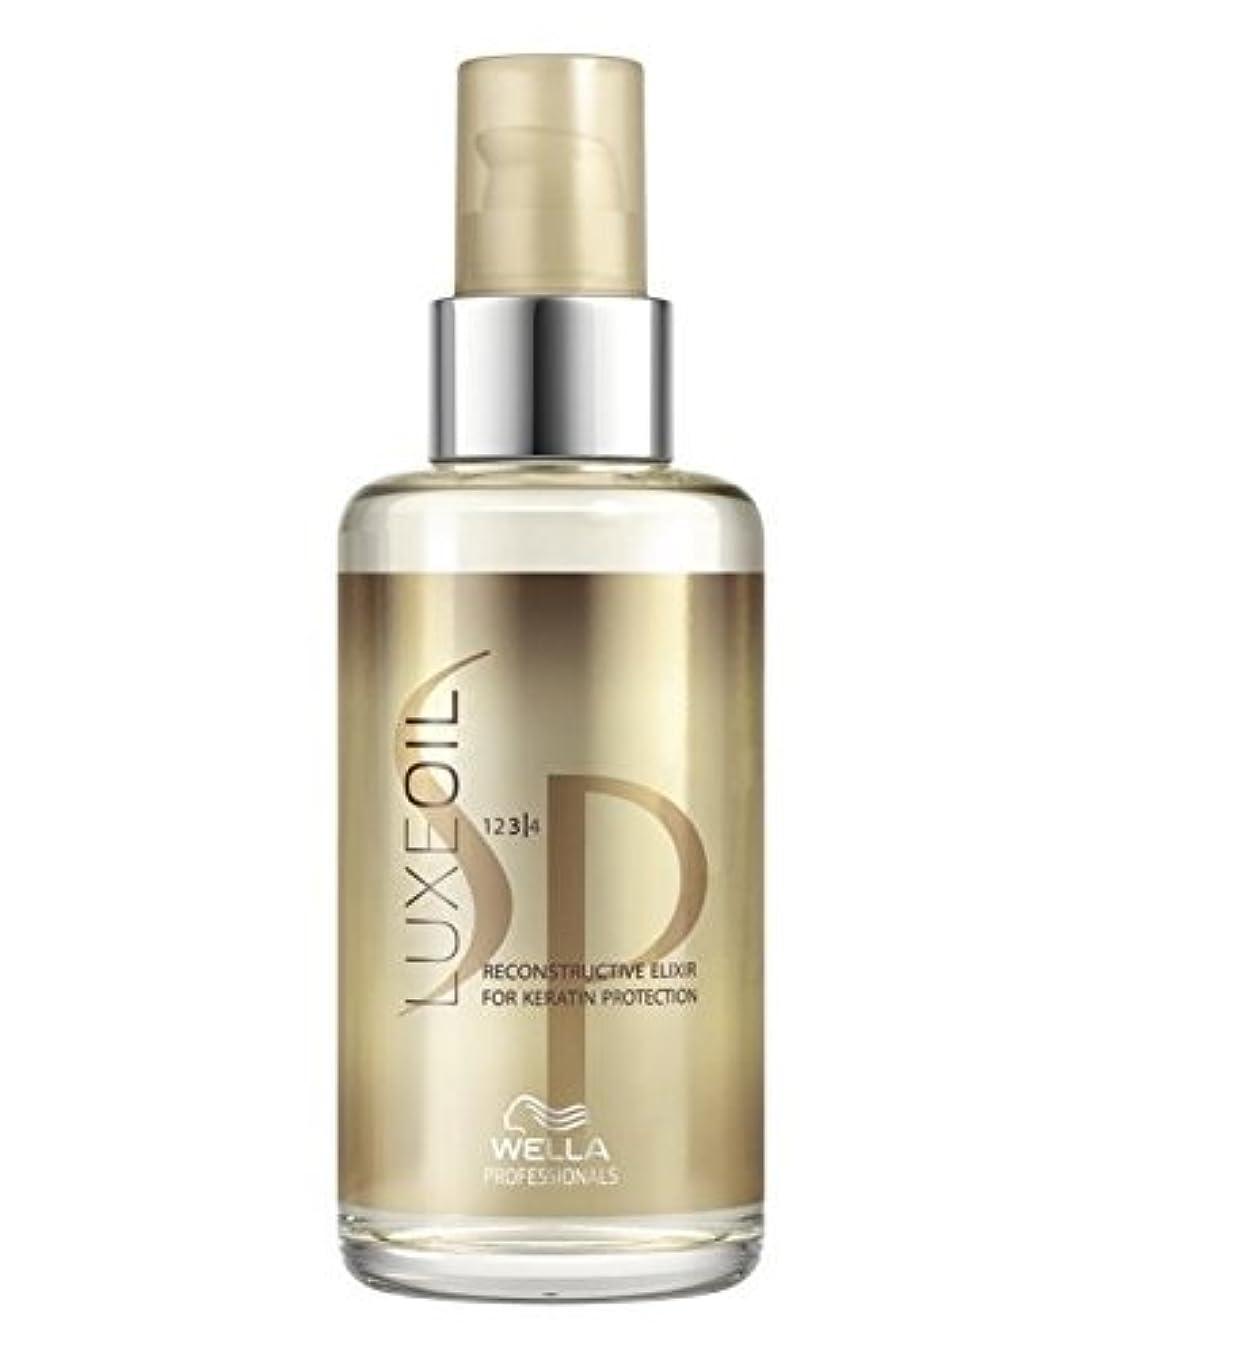 SP by Wella Luxe Hair Oil Reconstructive Elixir 100ml by Wella [並行輸入品]